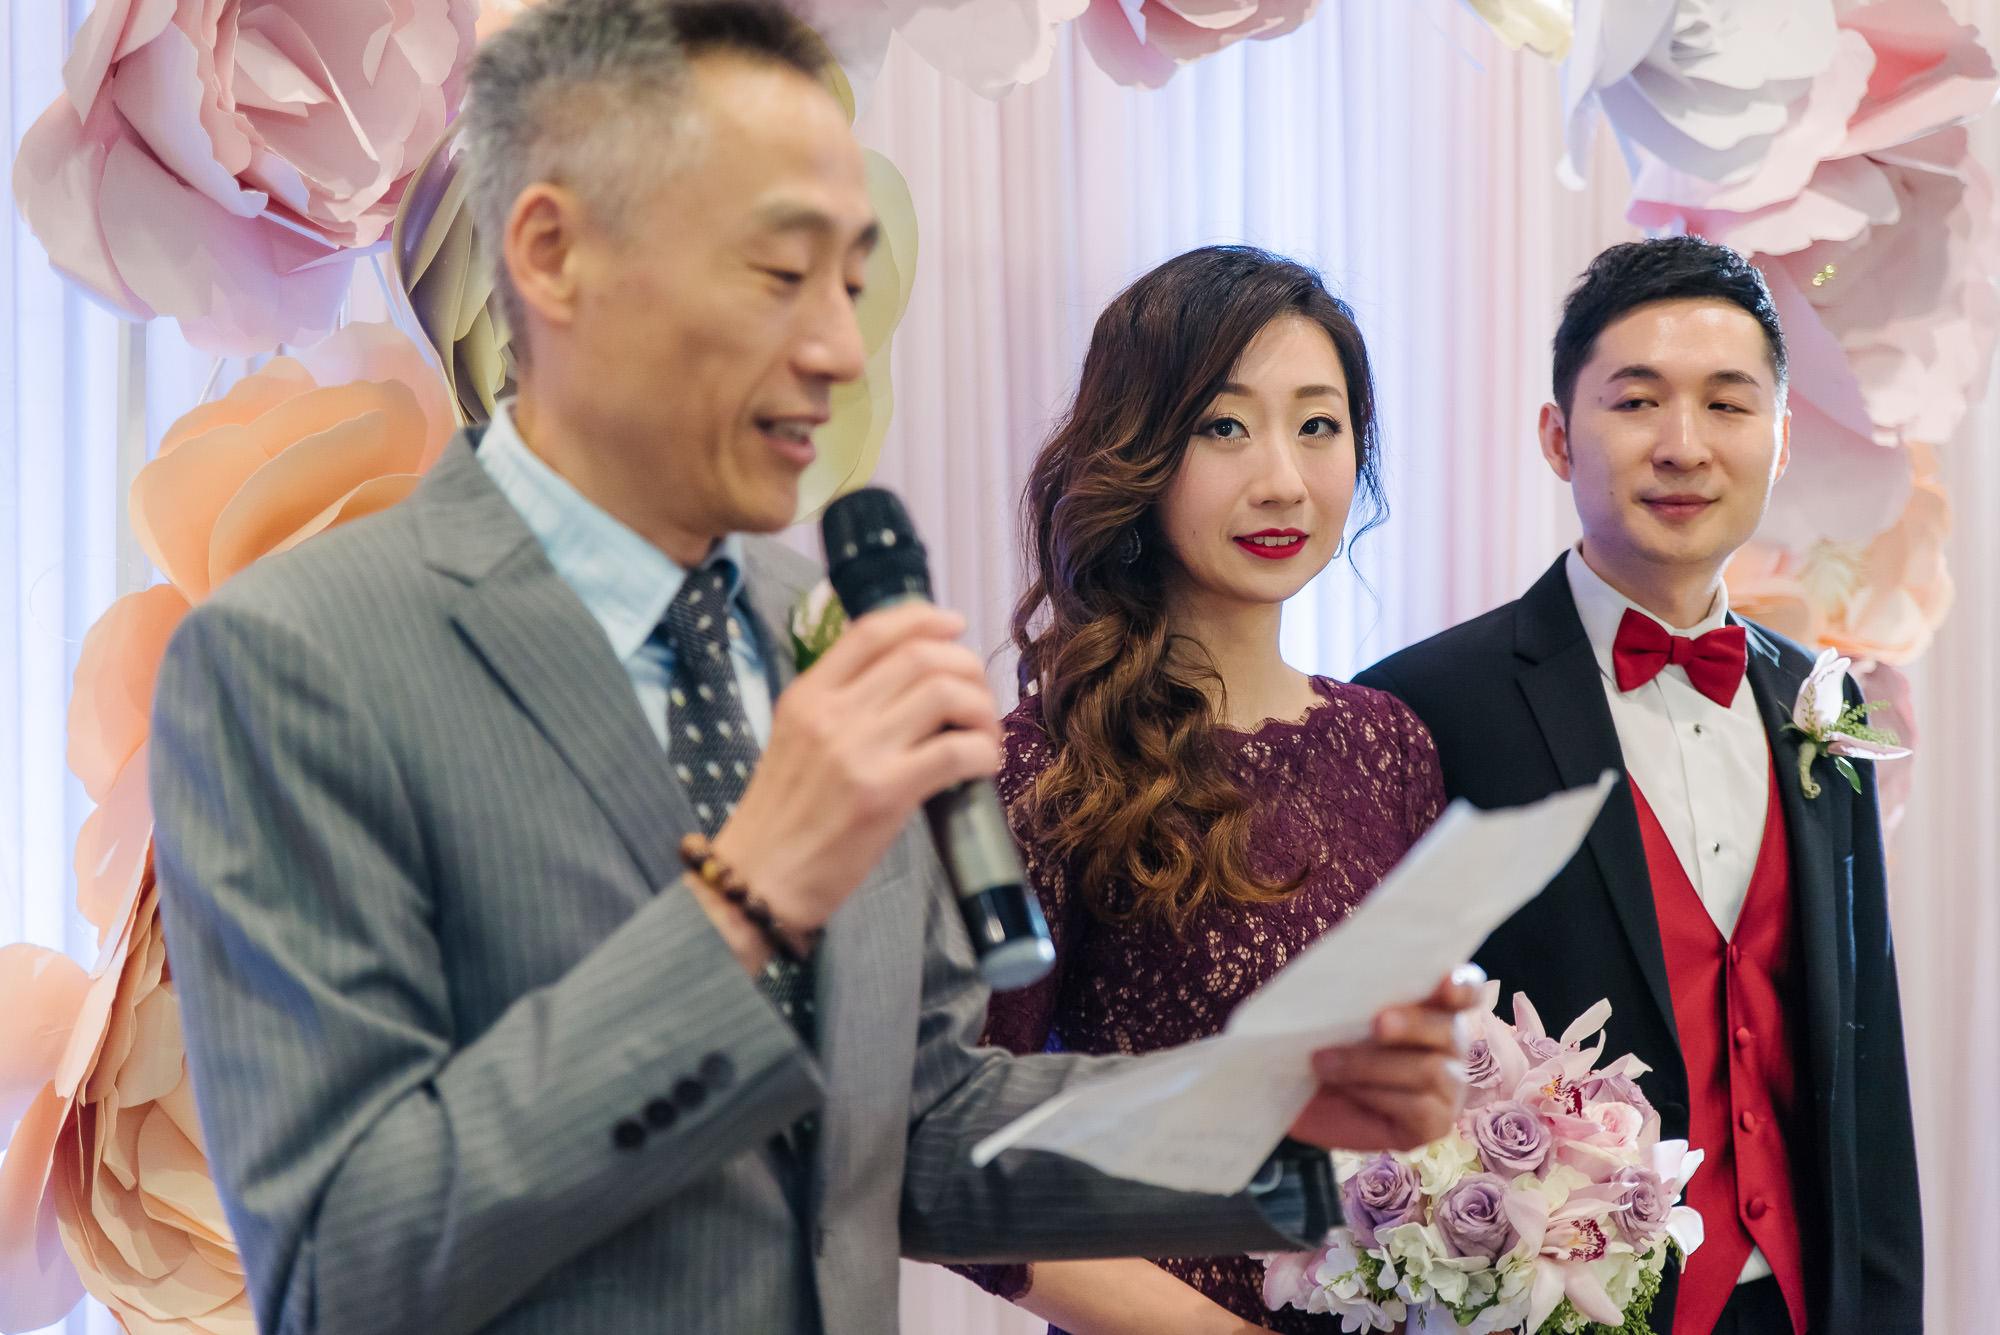 richmond_wedding_reception 1856083.jpg